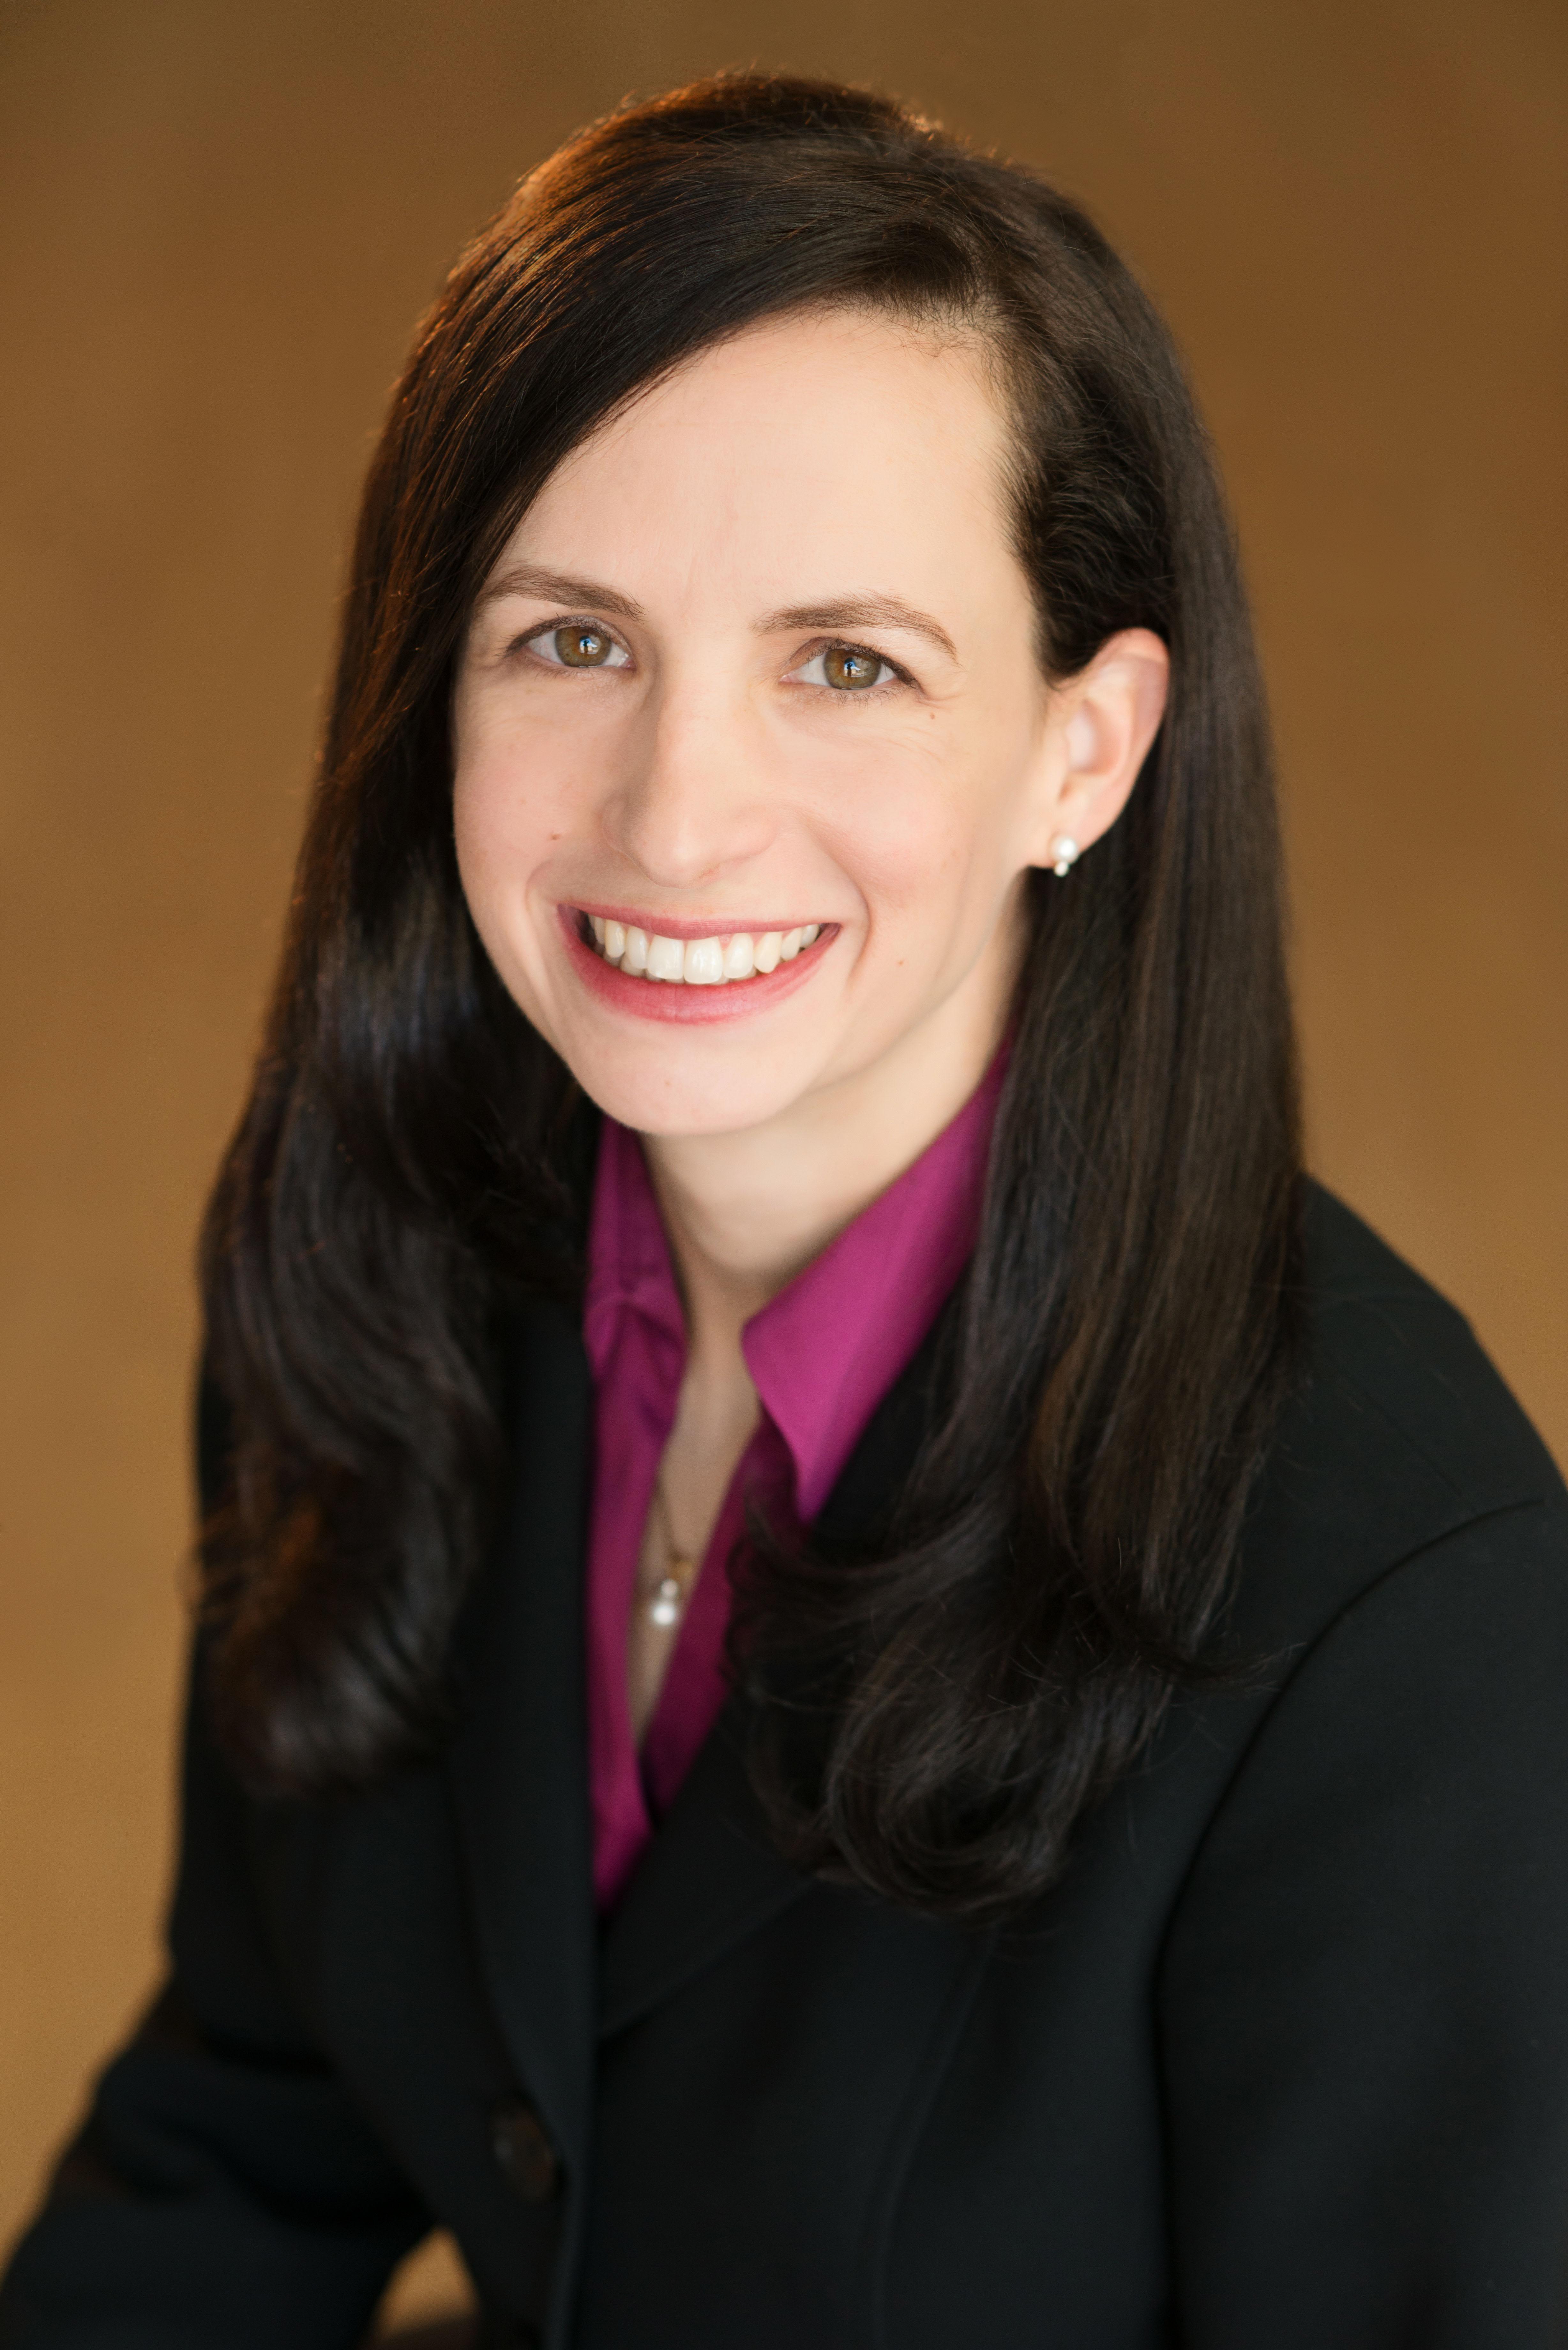 Maureen Atwell. Photo courtesy of the Hebron House of Hospitality.